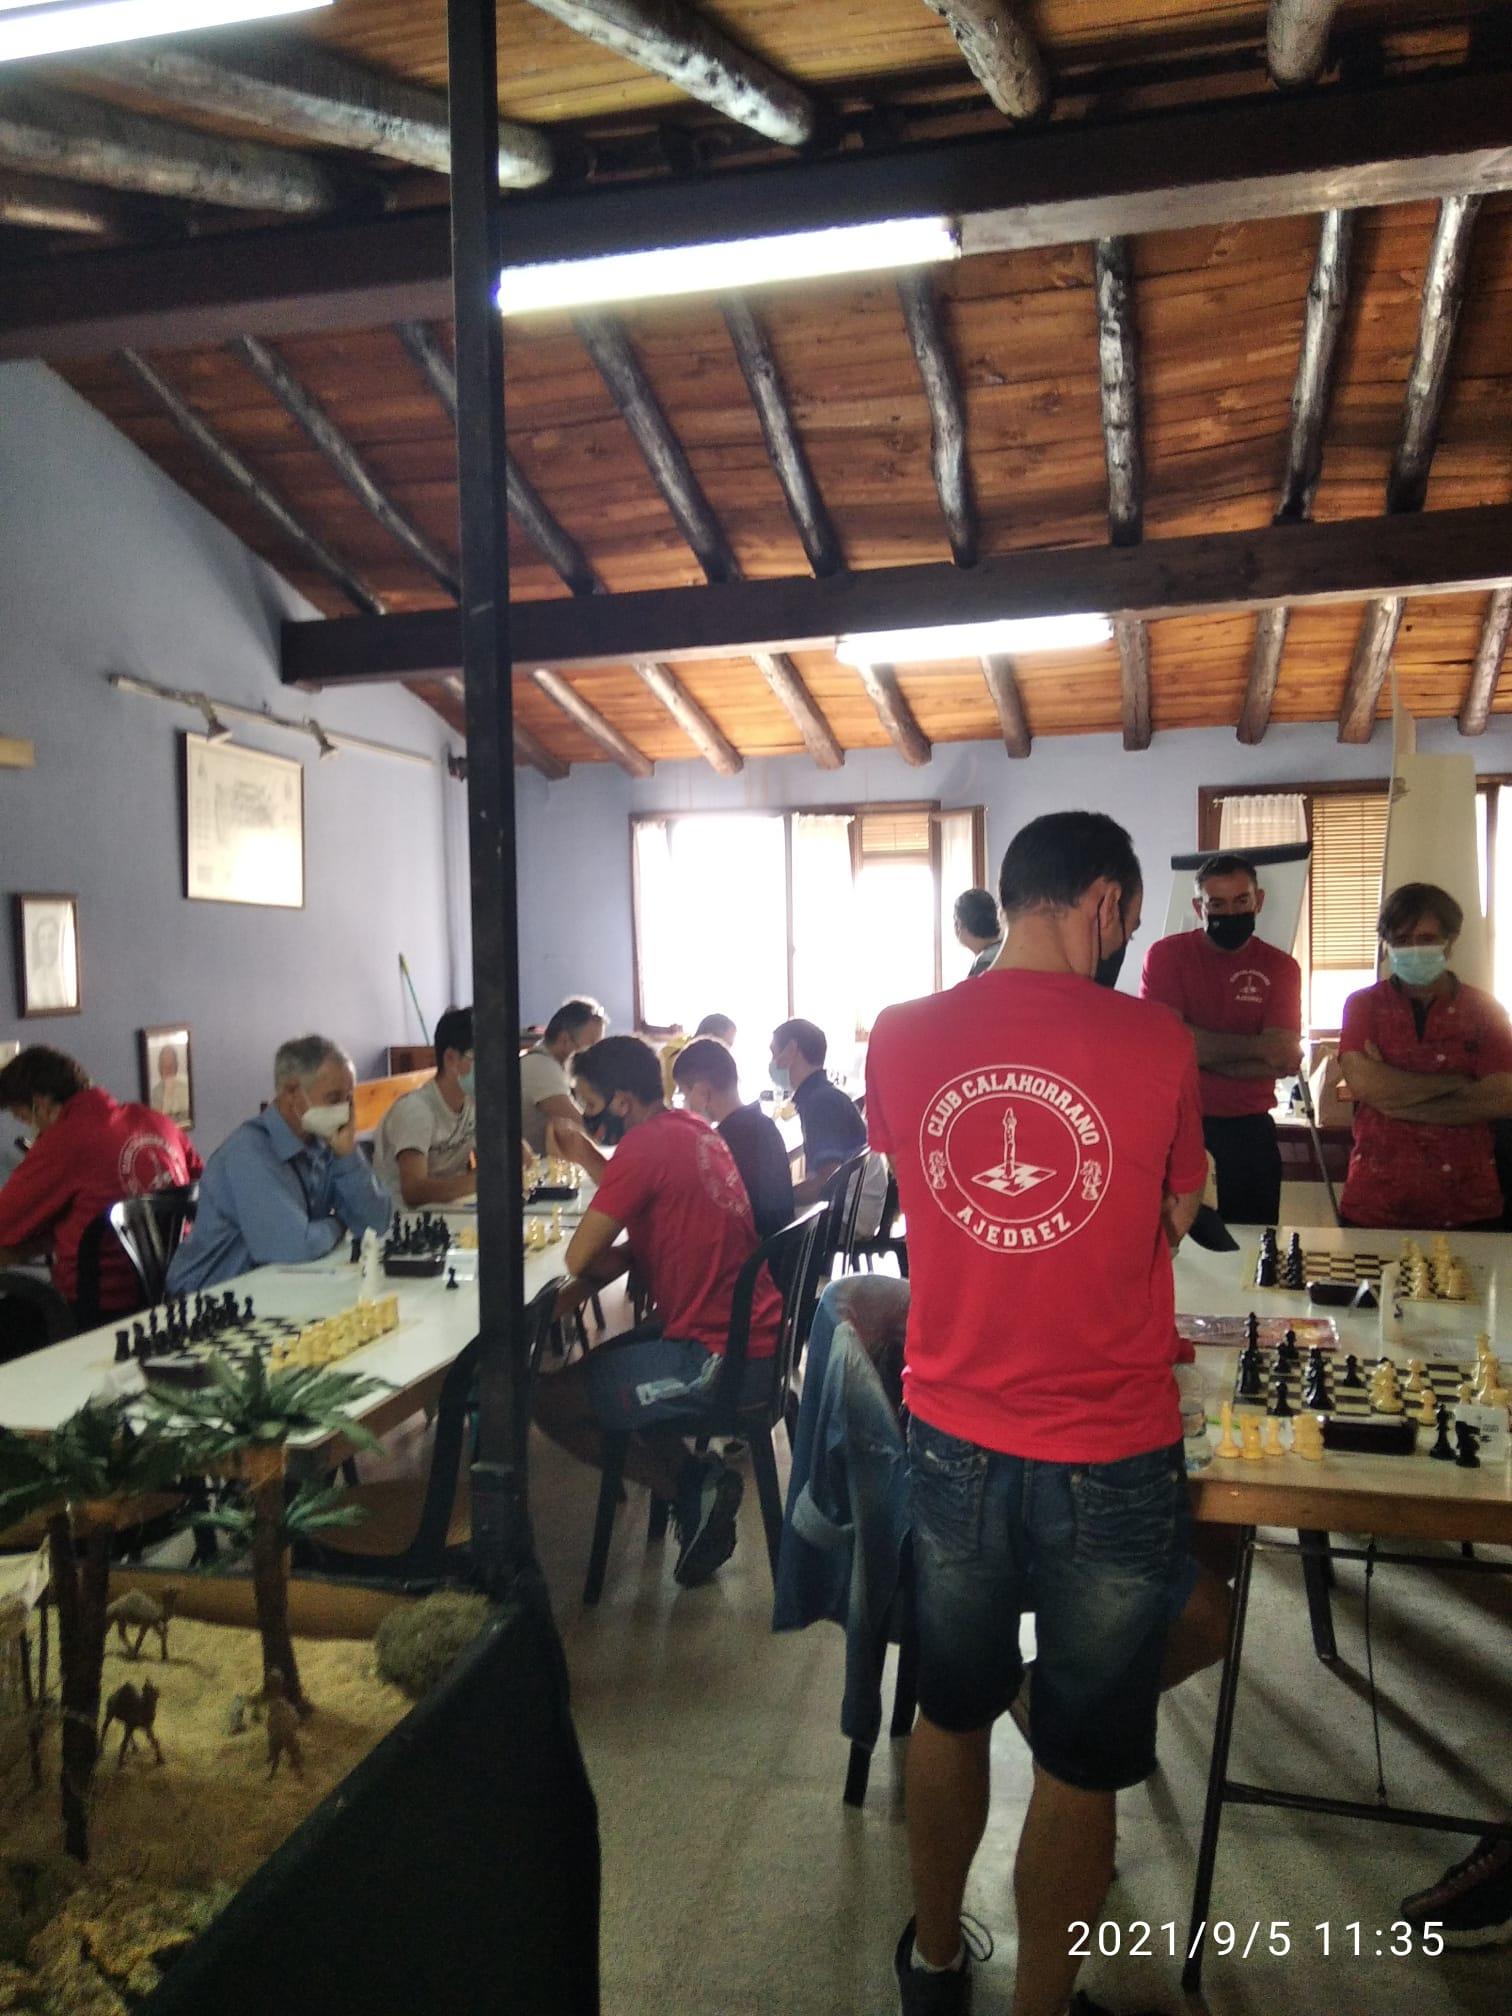 torneo social club calahorrano ajedrez 5-09-2021